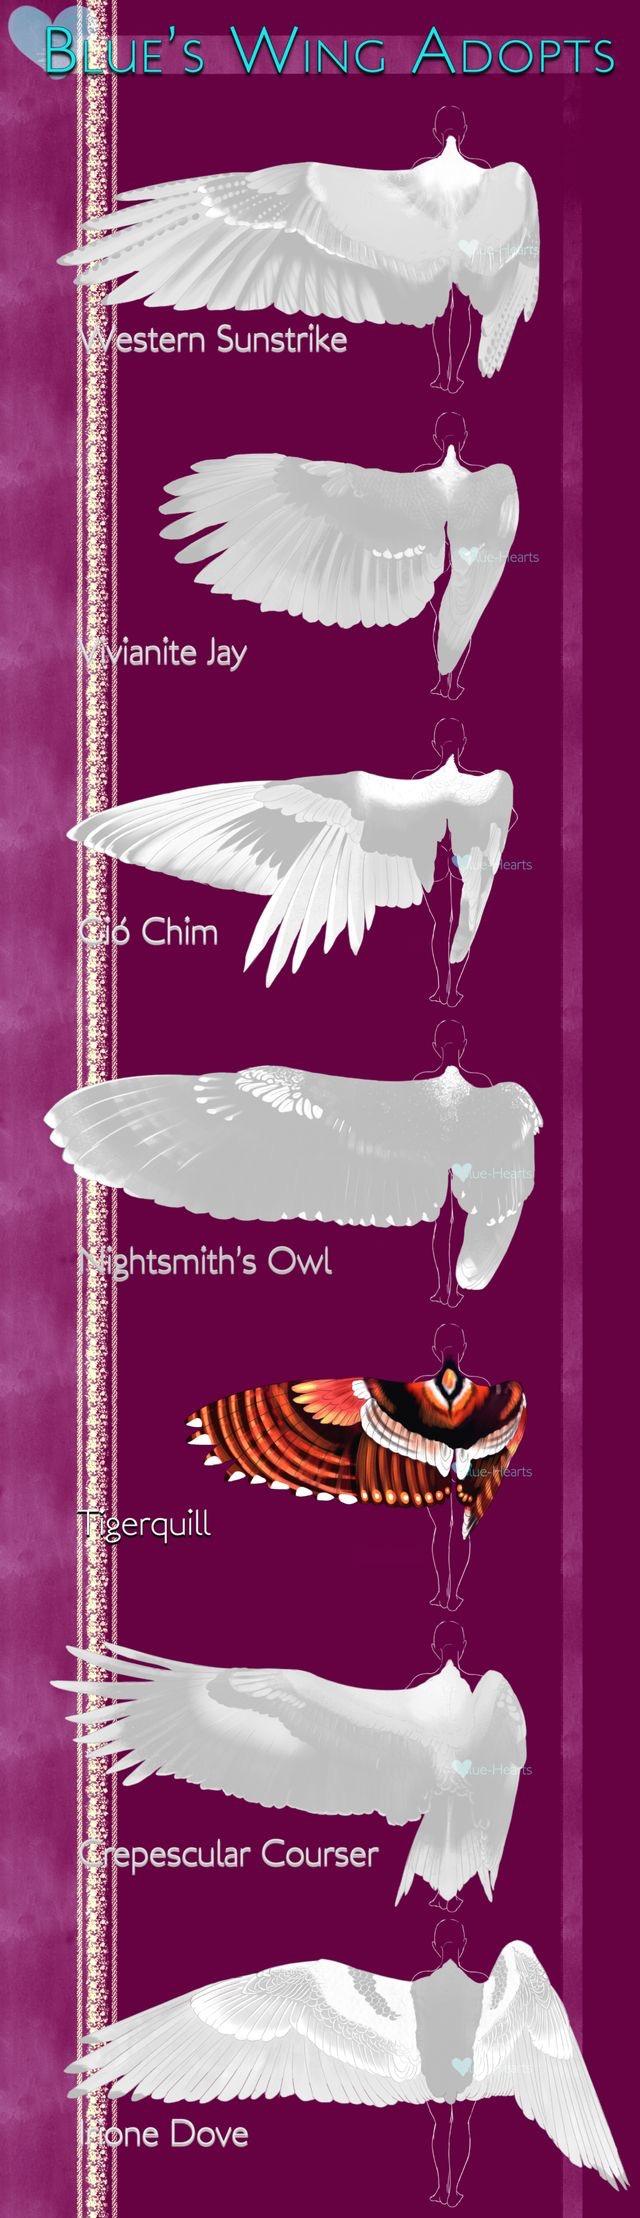 Pin By Hannah Sevestedt On Story Telling 2 Wings Art Wings Drawing Wings